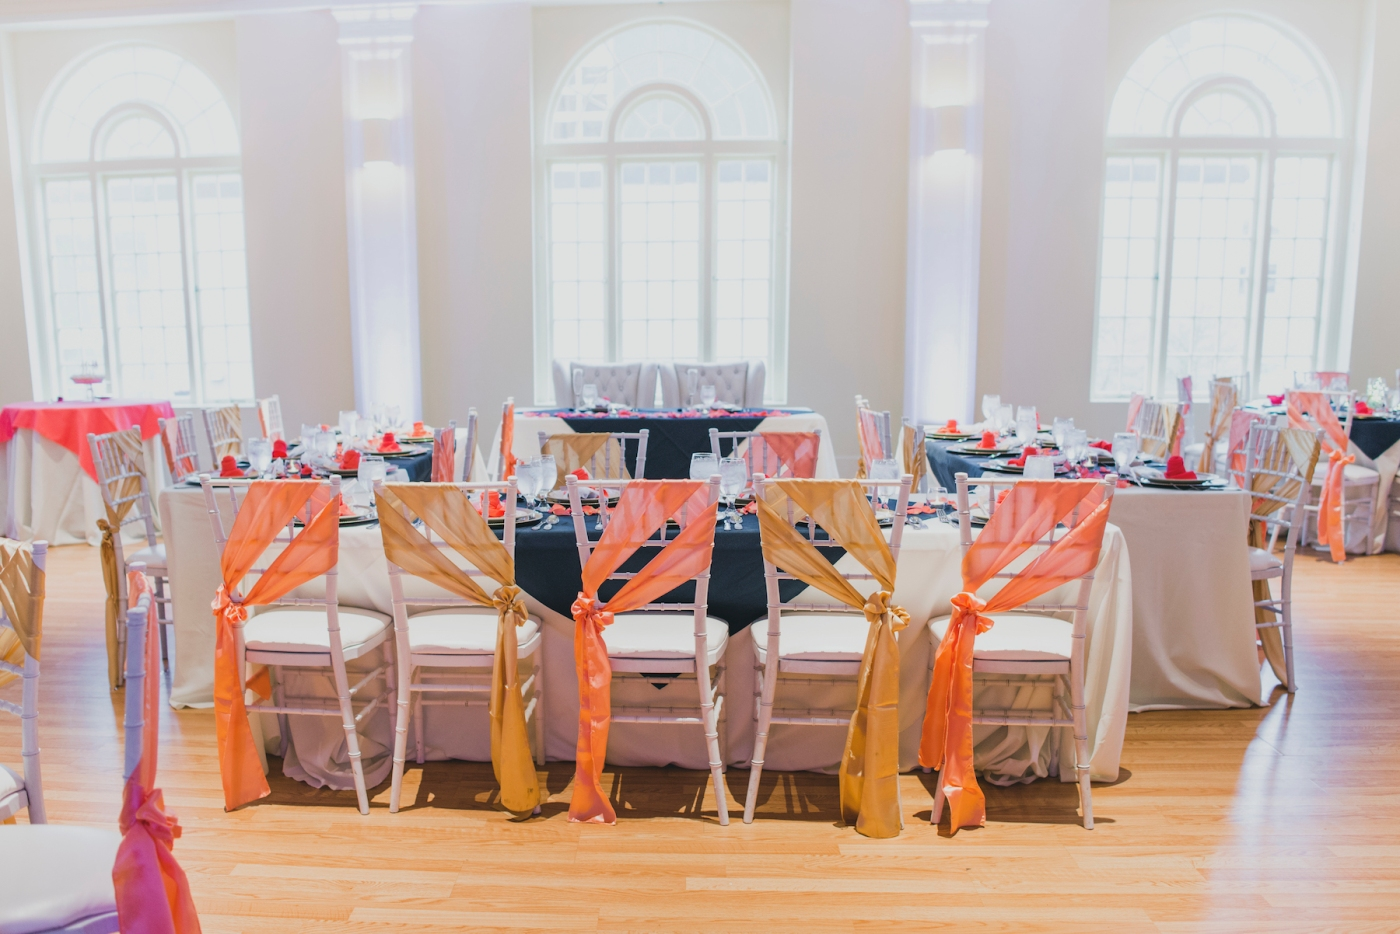 DSC_3072Everett_Wedding_Ballroom_Jane_Speleers_photography_Rachel_and_Edmund_cake cutting_2017